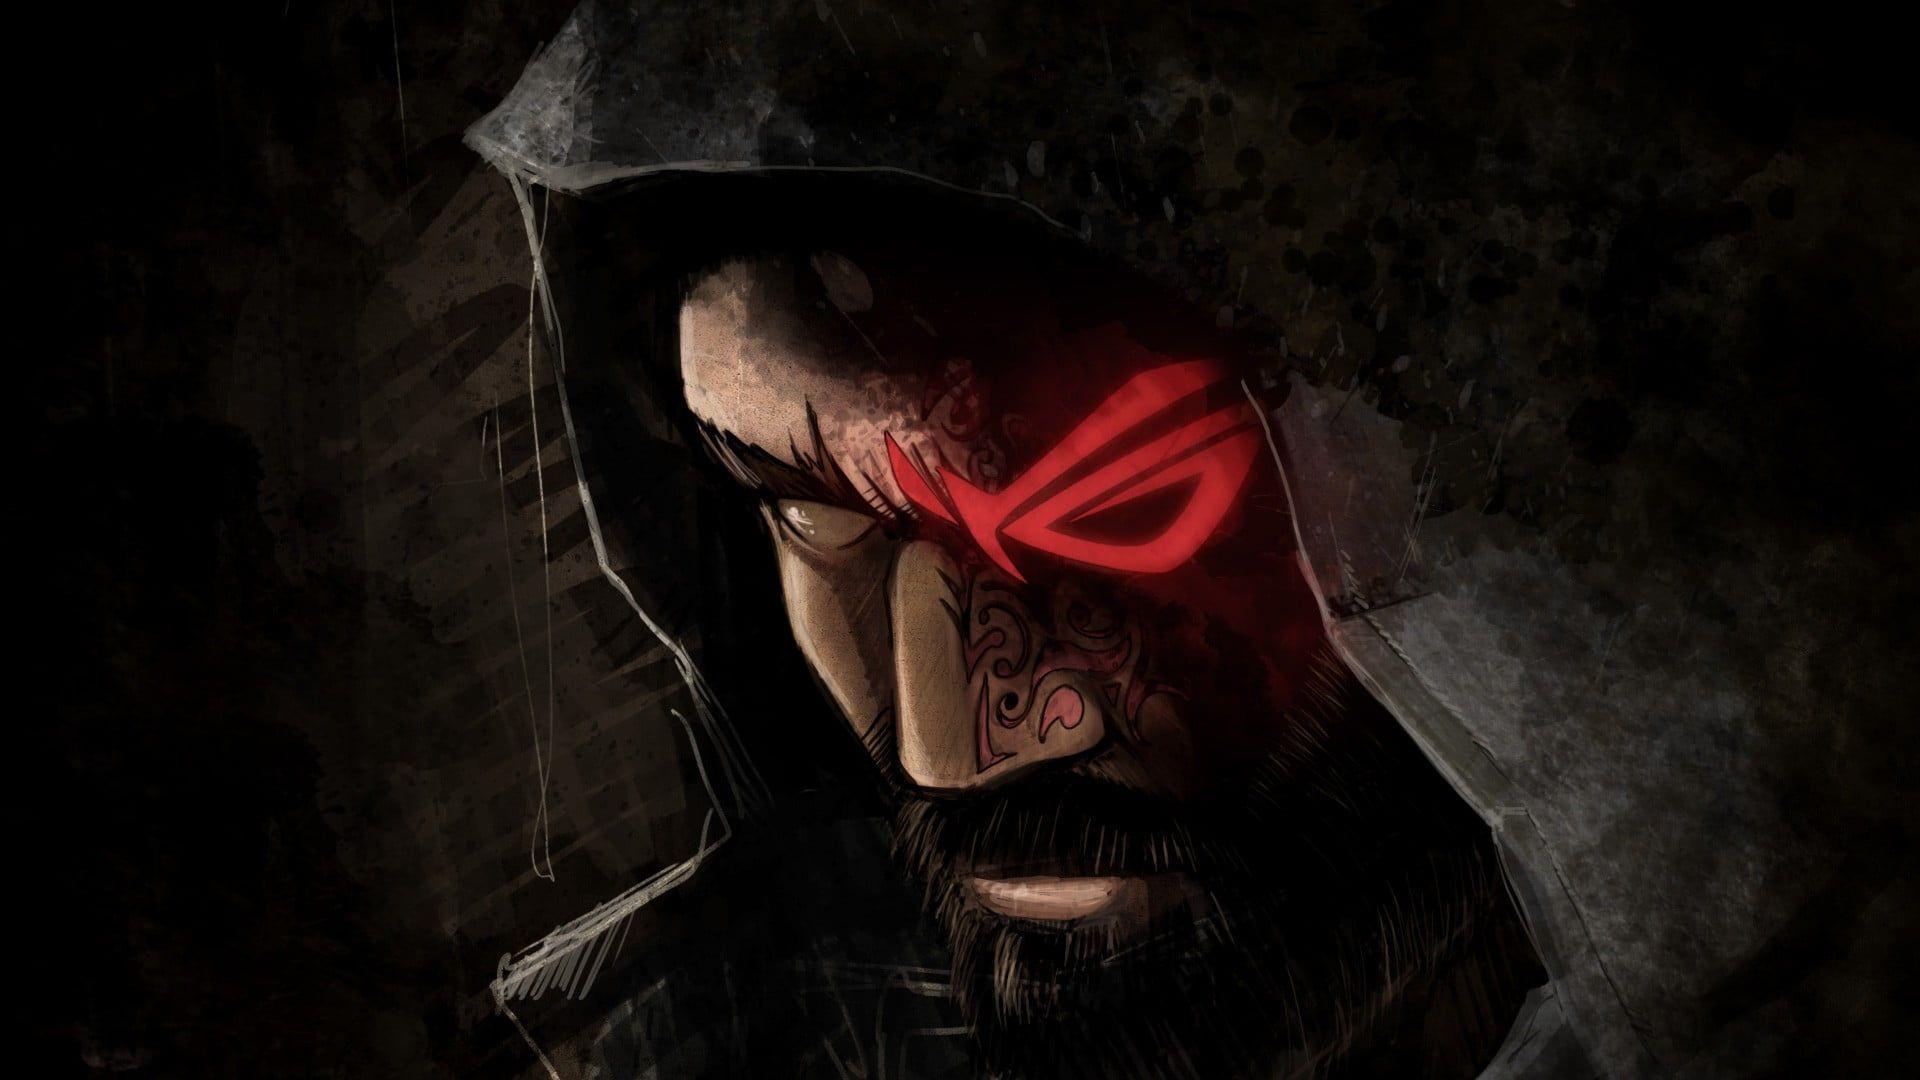 Man Wearing Hood Wallpaper Republic Of Gamers Asus Fantasy Art Hood Wallpapers Hd Wallpaper Asus Rog